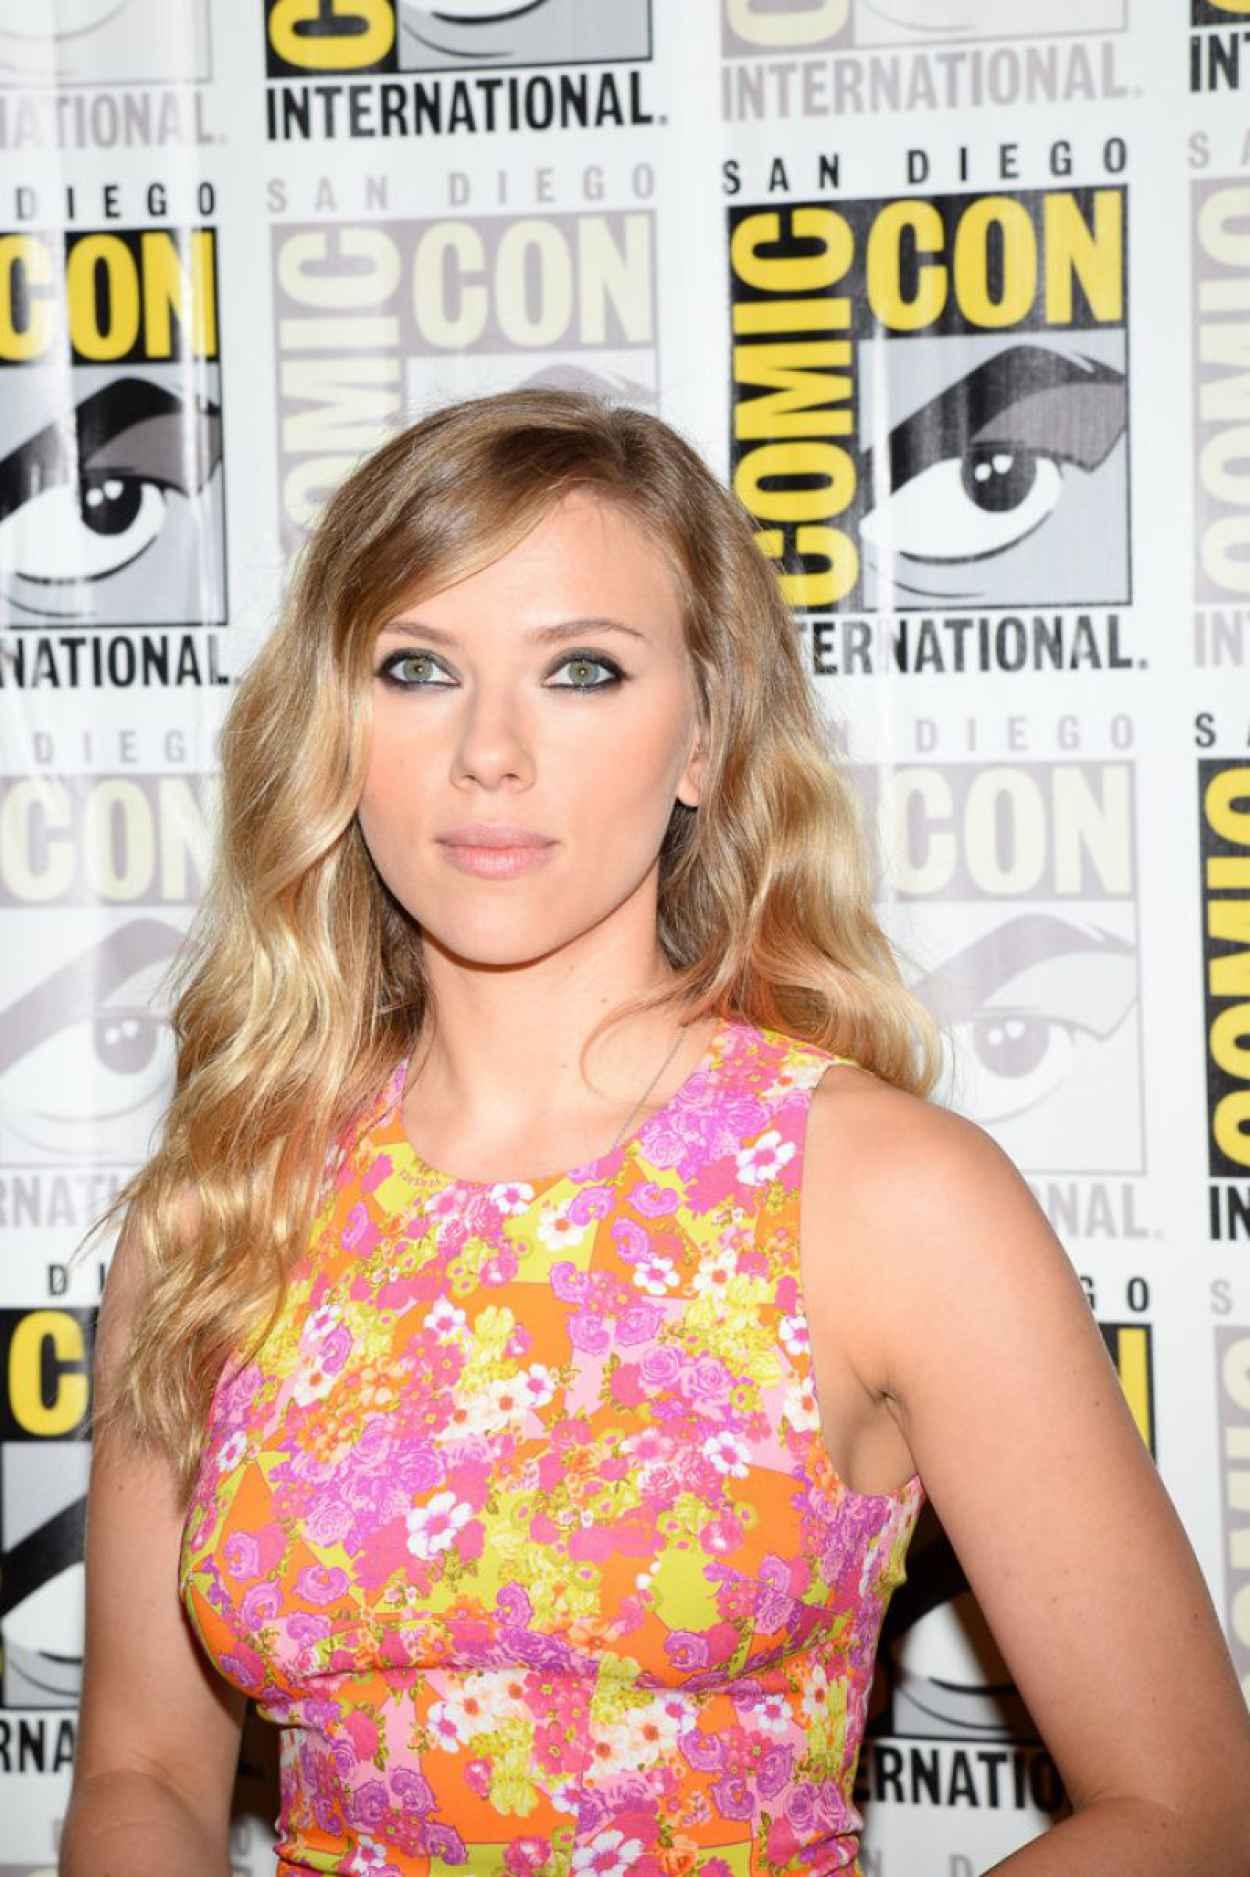 Scarlett Johansson - The Marvel Studios at Comic-Con 2015-1